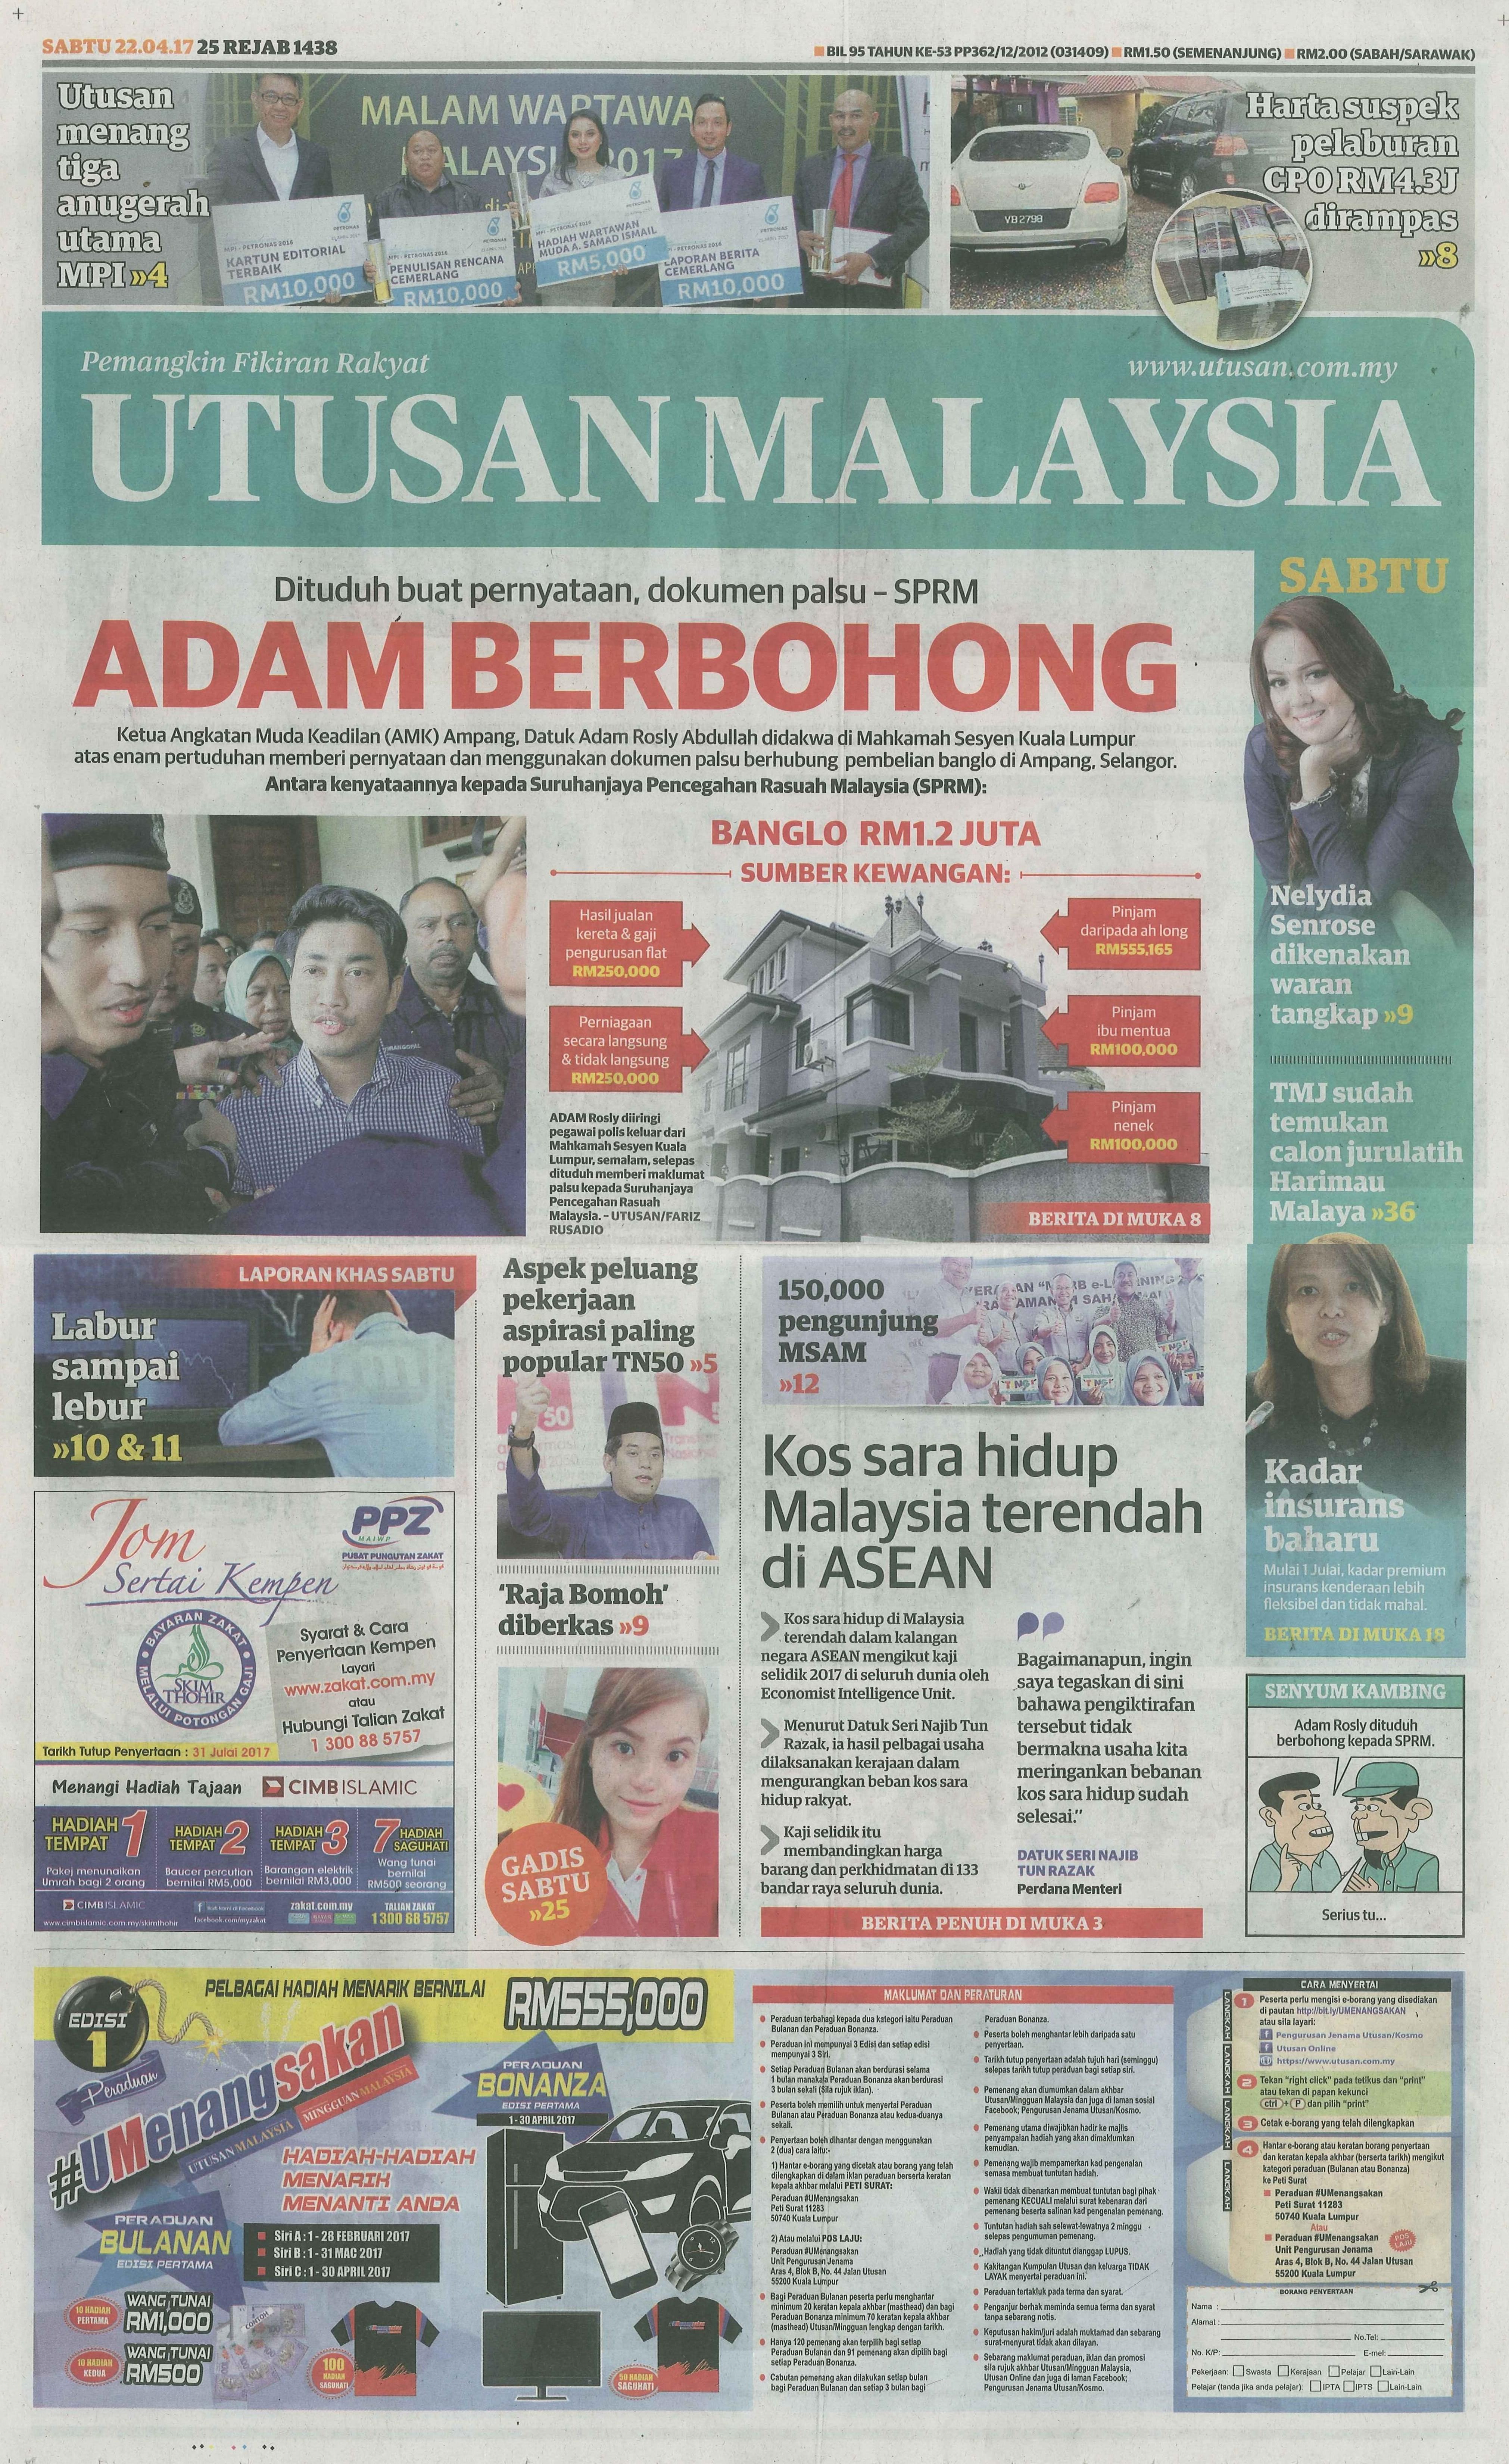 UTUSAN MALAYSIA 22.4.2017 1